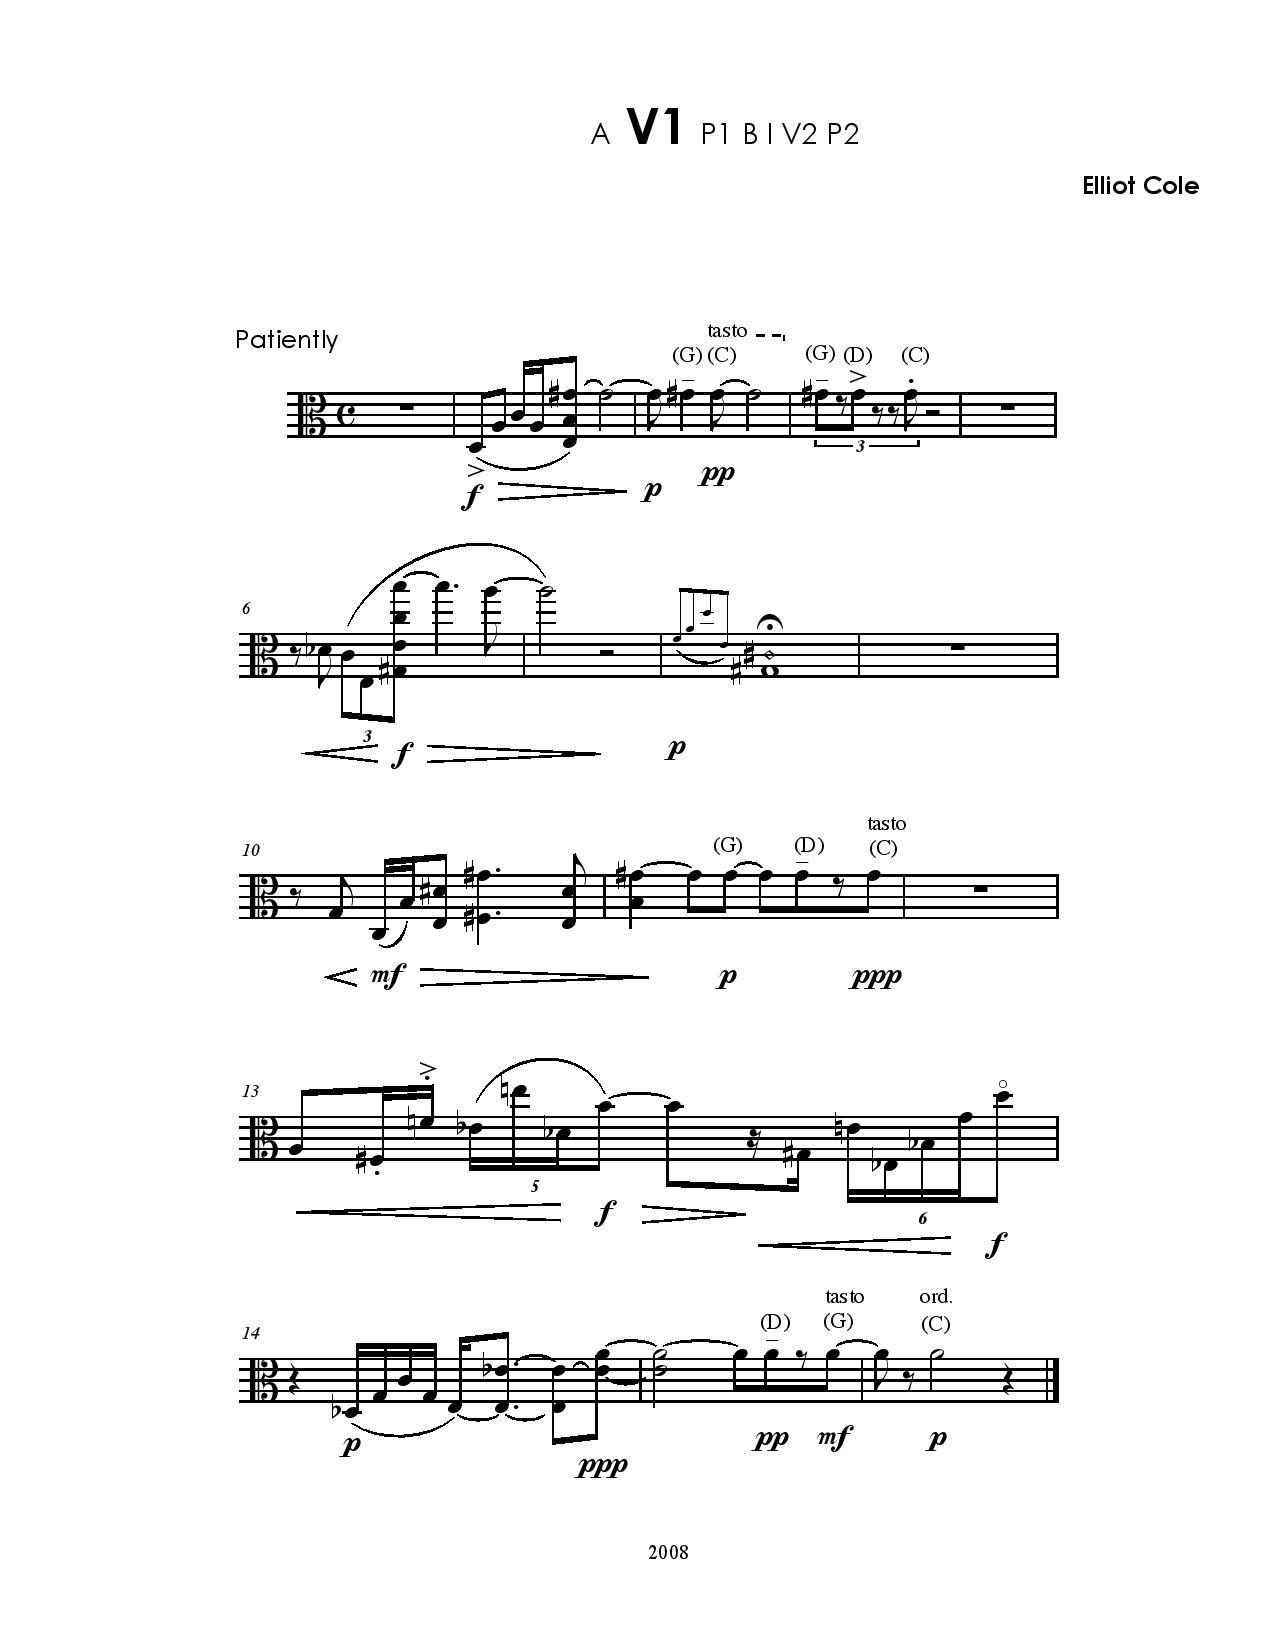 elliotcole-O-page-004.jpg